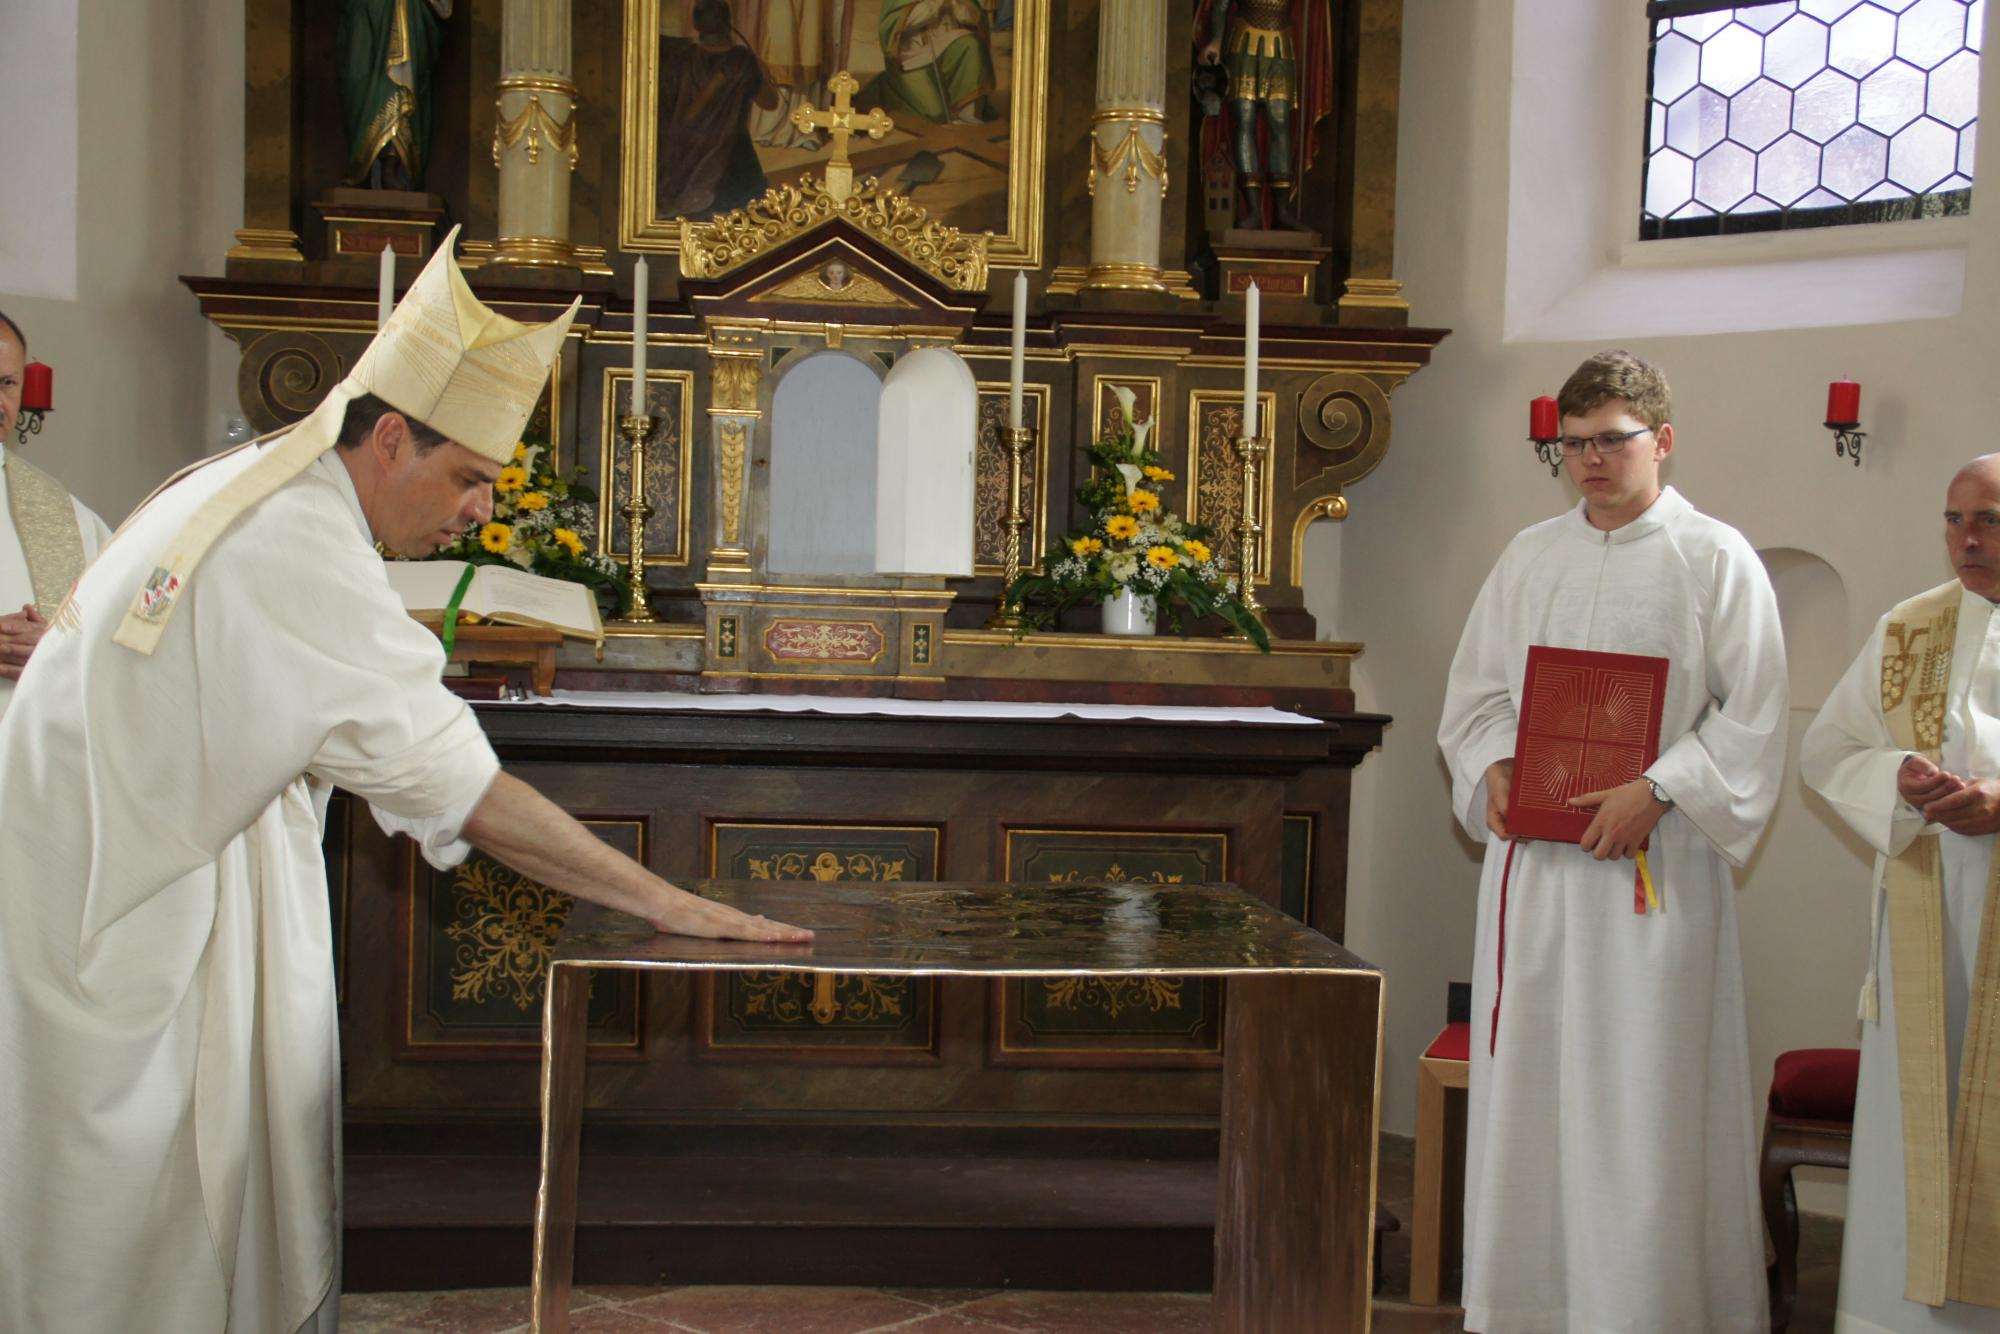 Altarweihe-Lengsham-DSC06300